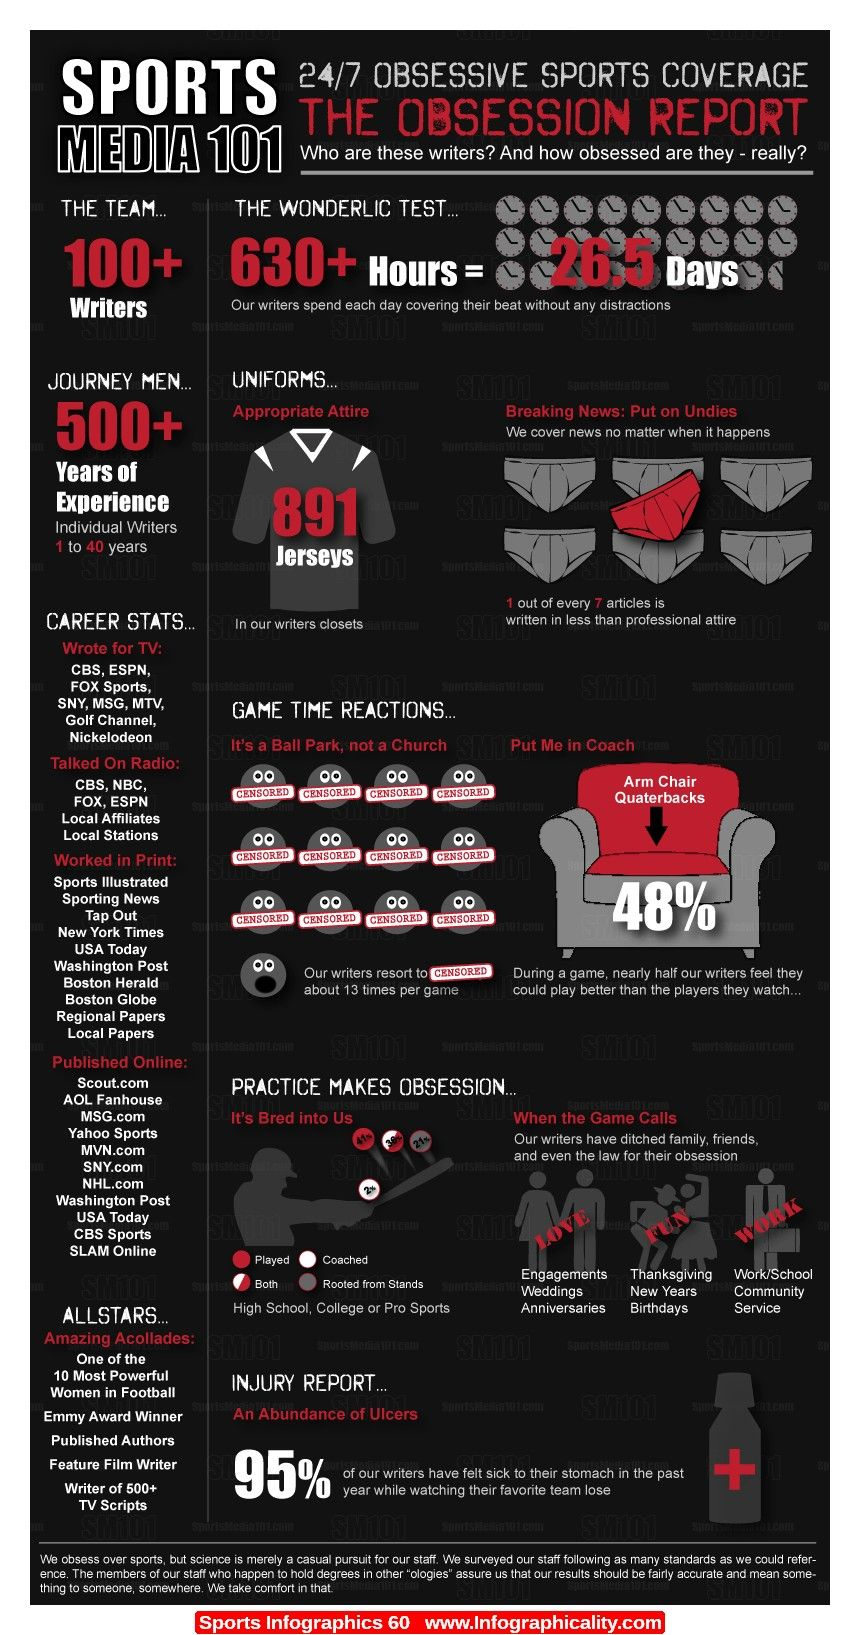 Sports Infographics 60